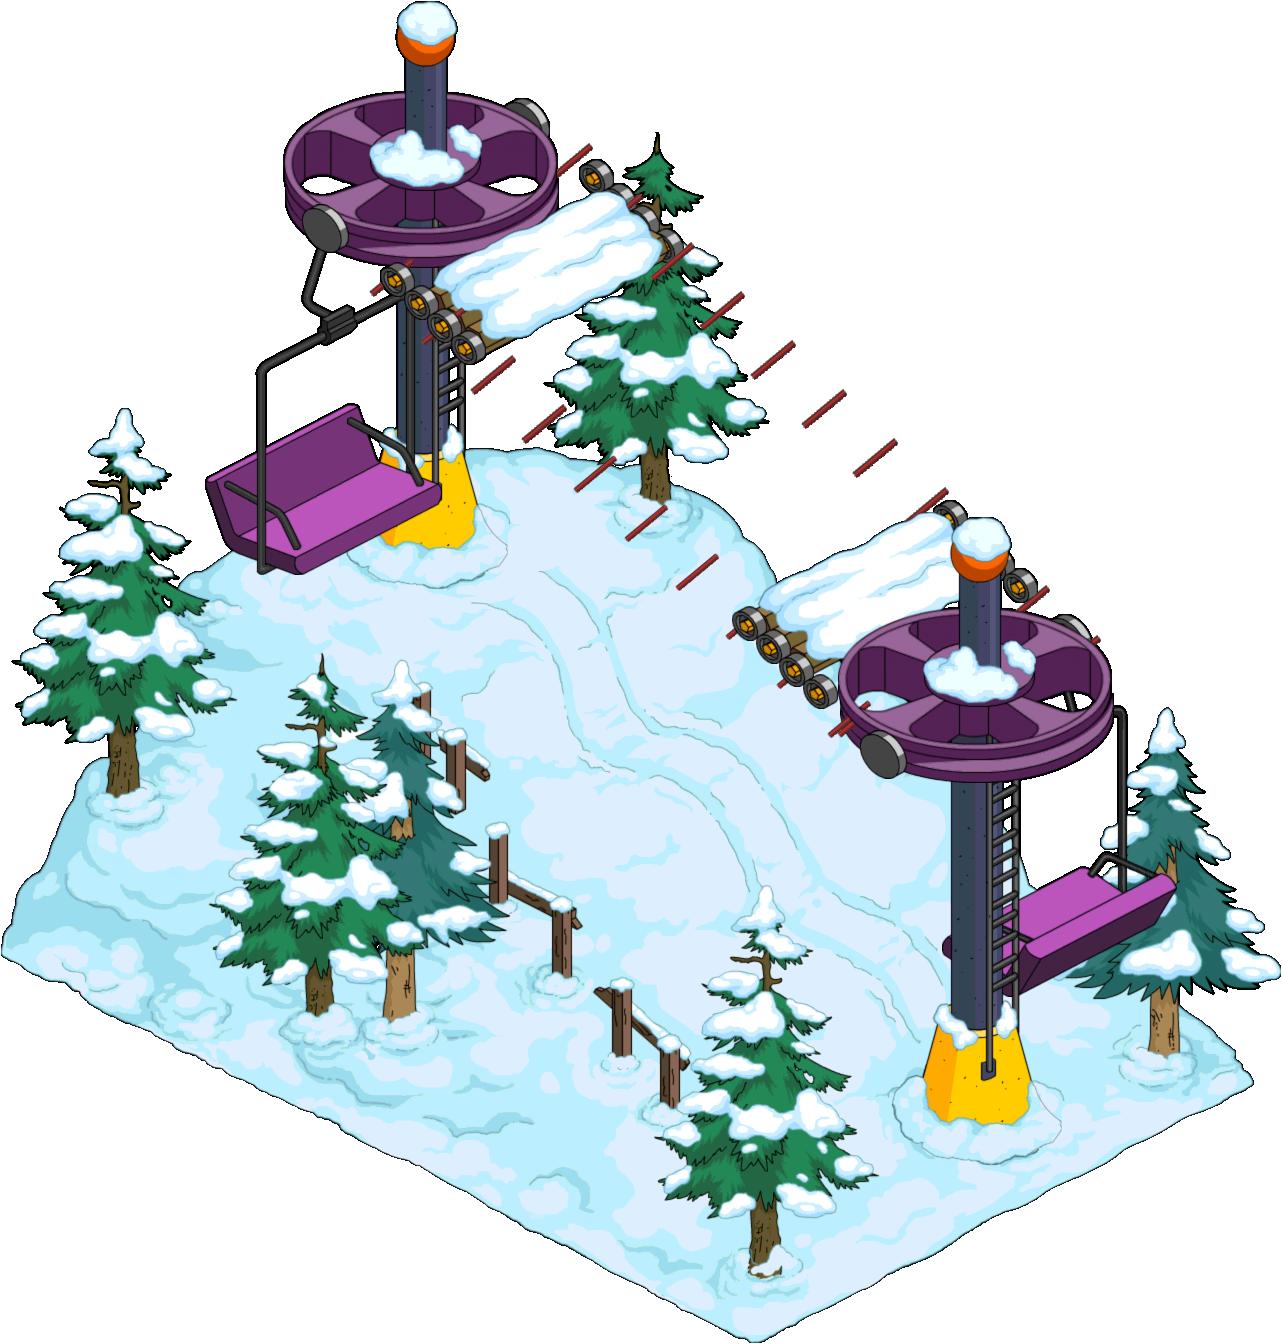 Ski lift the simpsons. Mailbox clipart winter